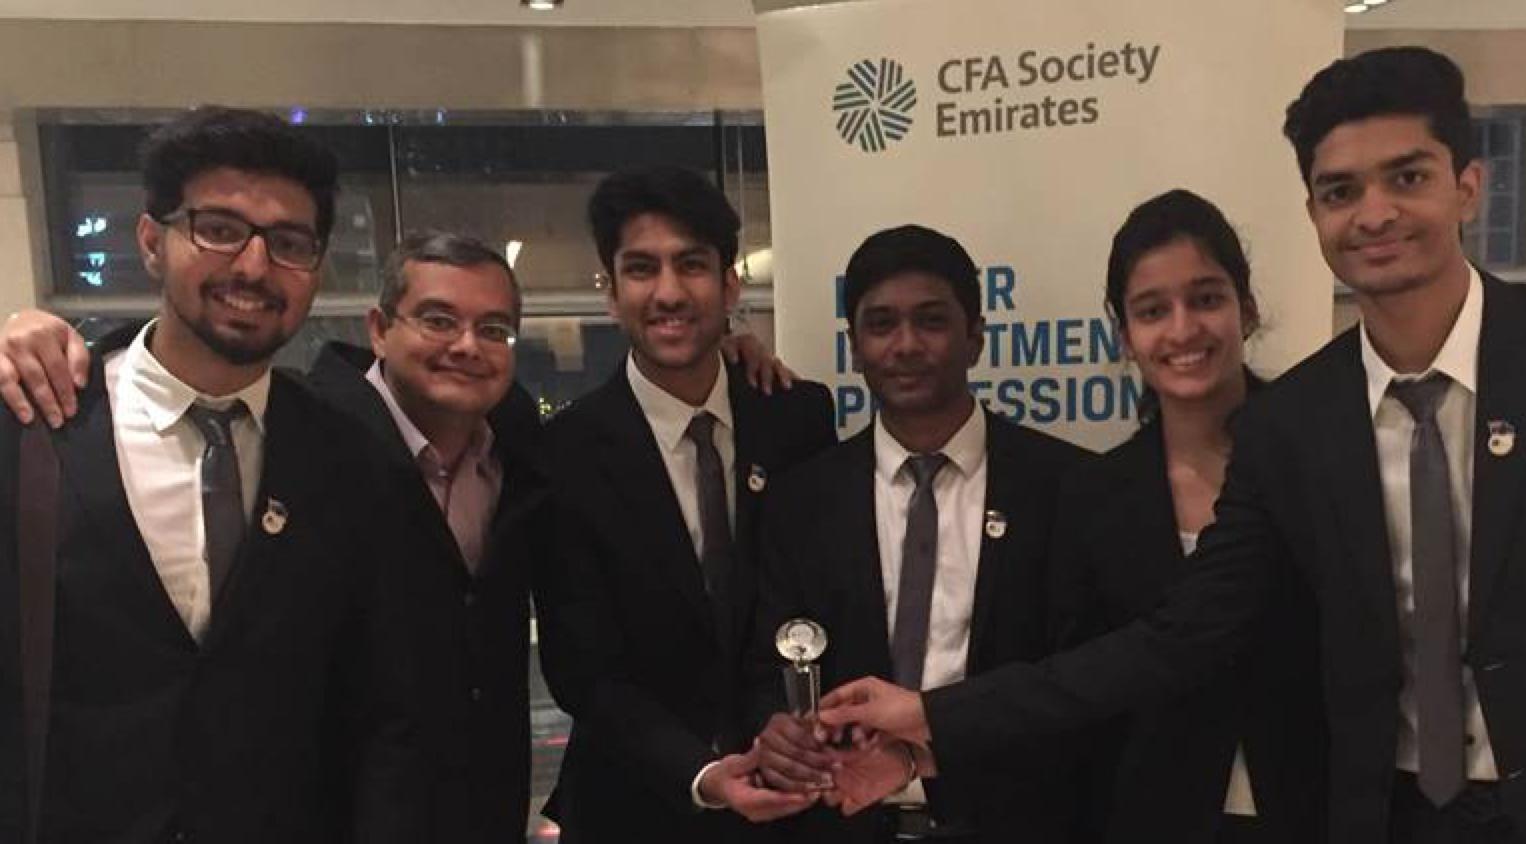 Winning Jags from left: Ganeshram, Prof Arindam, Kunal, Sai Kartheek, Lavena and Aadit